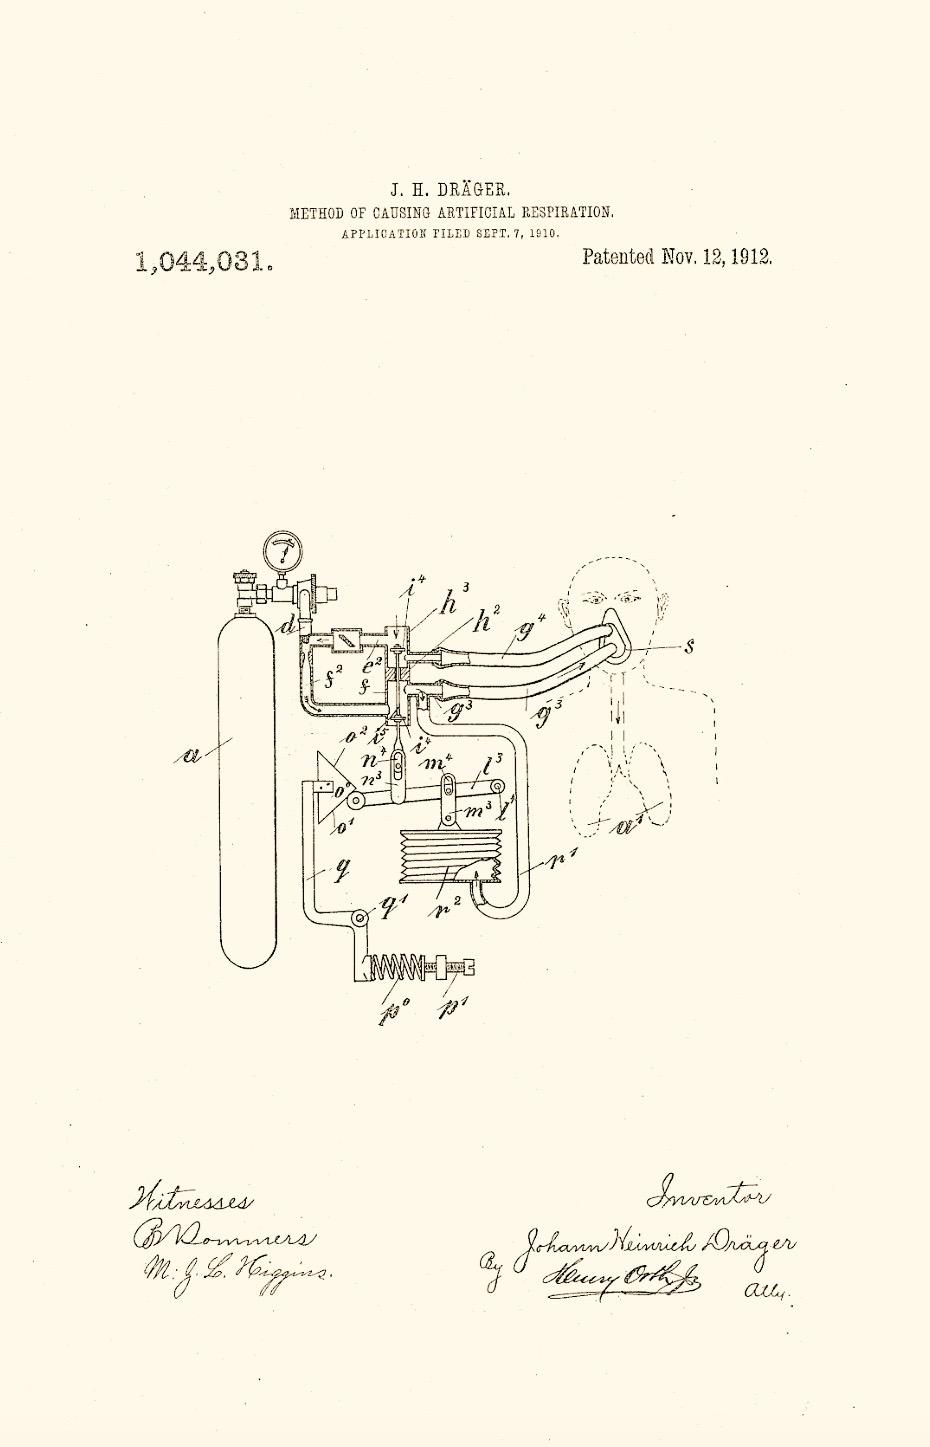 1912 Draeger Patent